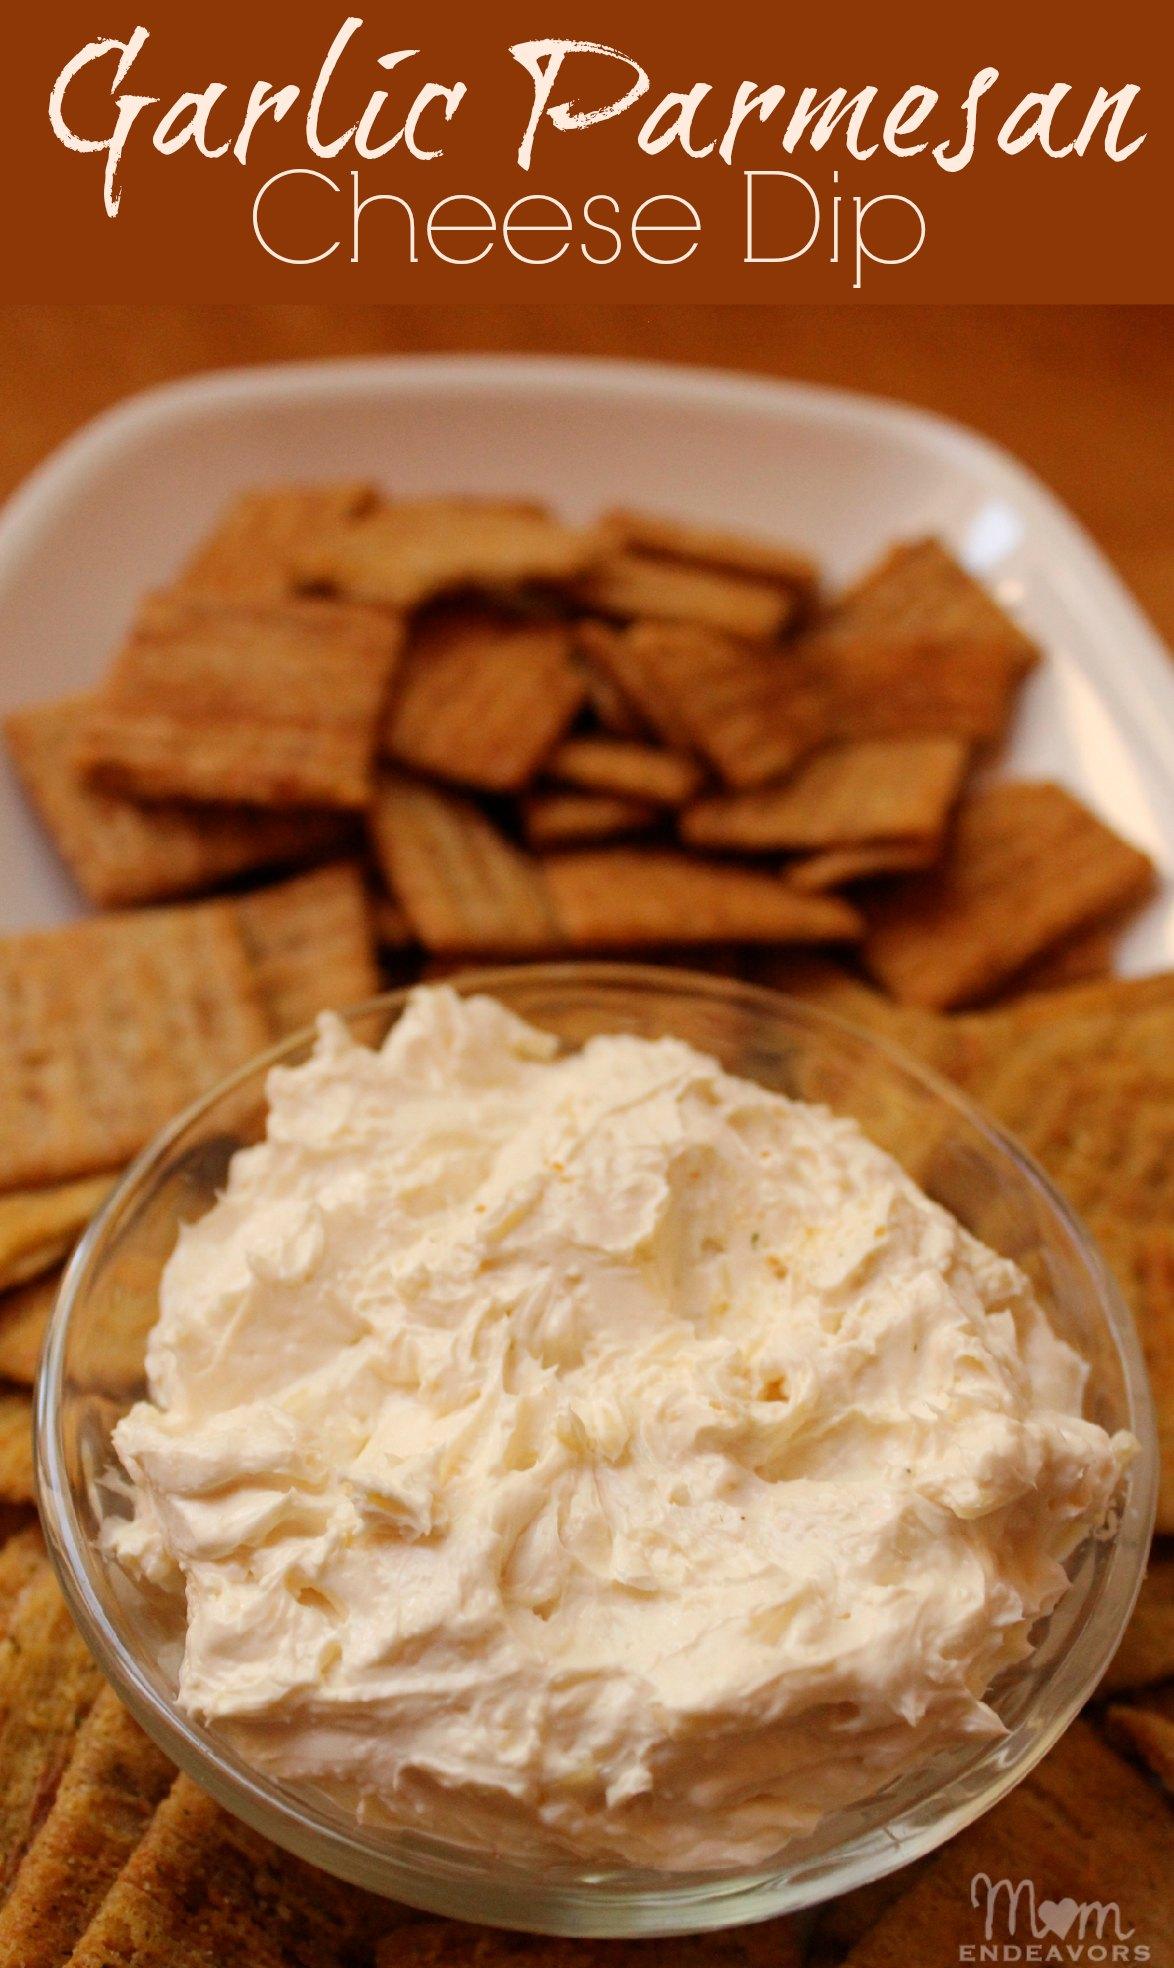 Garlic Parmesan Cheese Dip